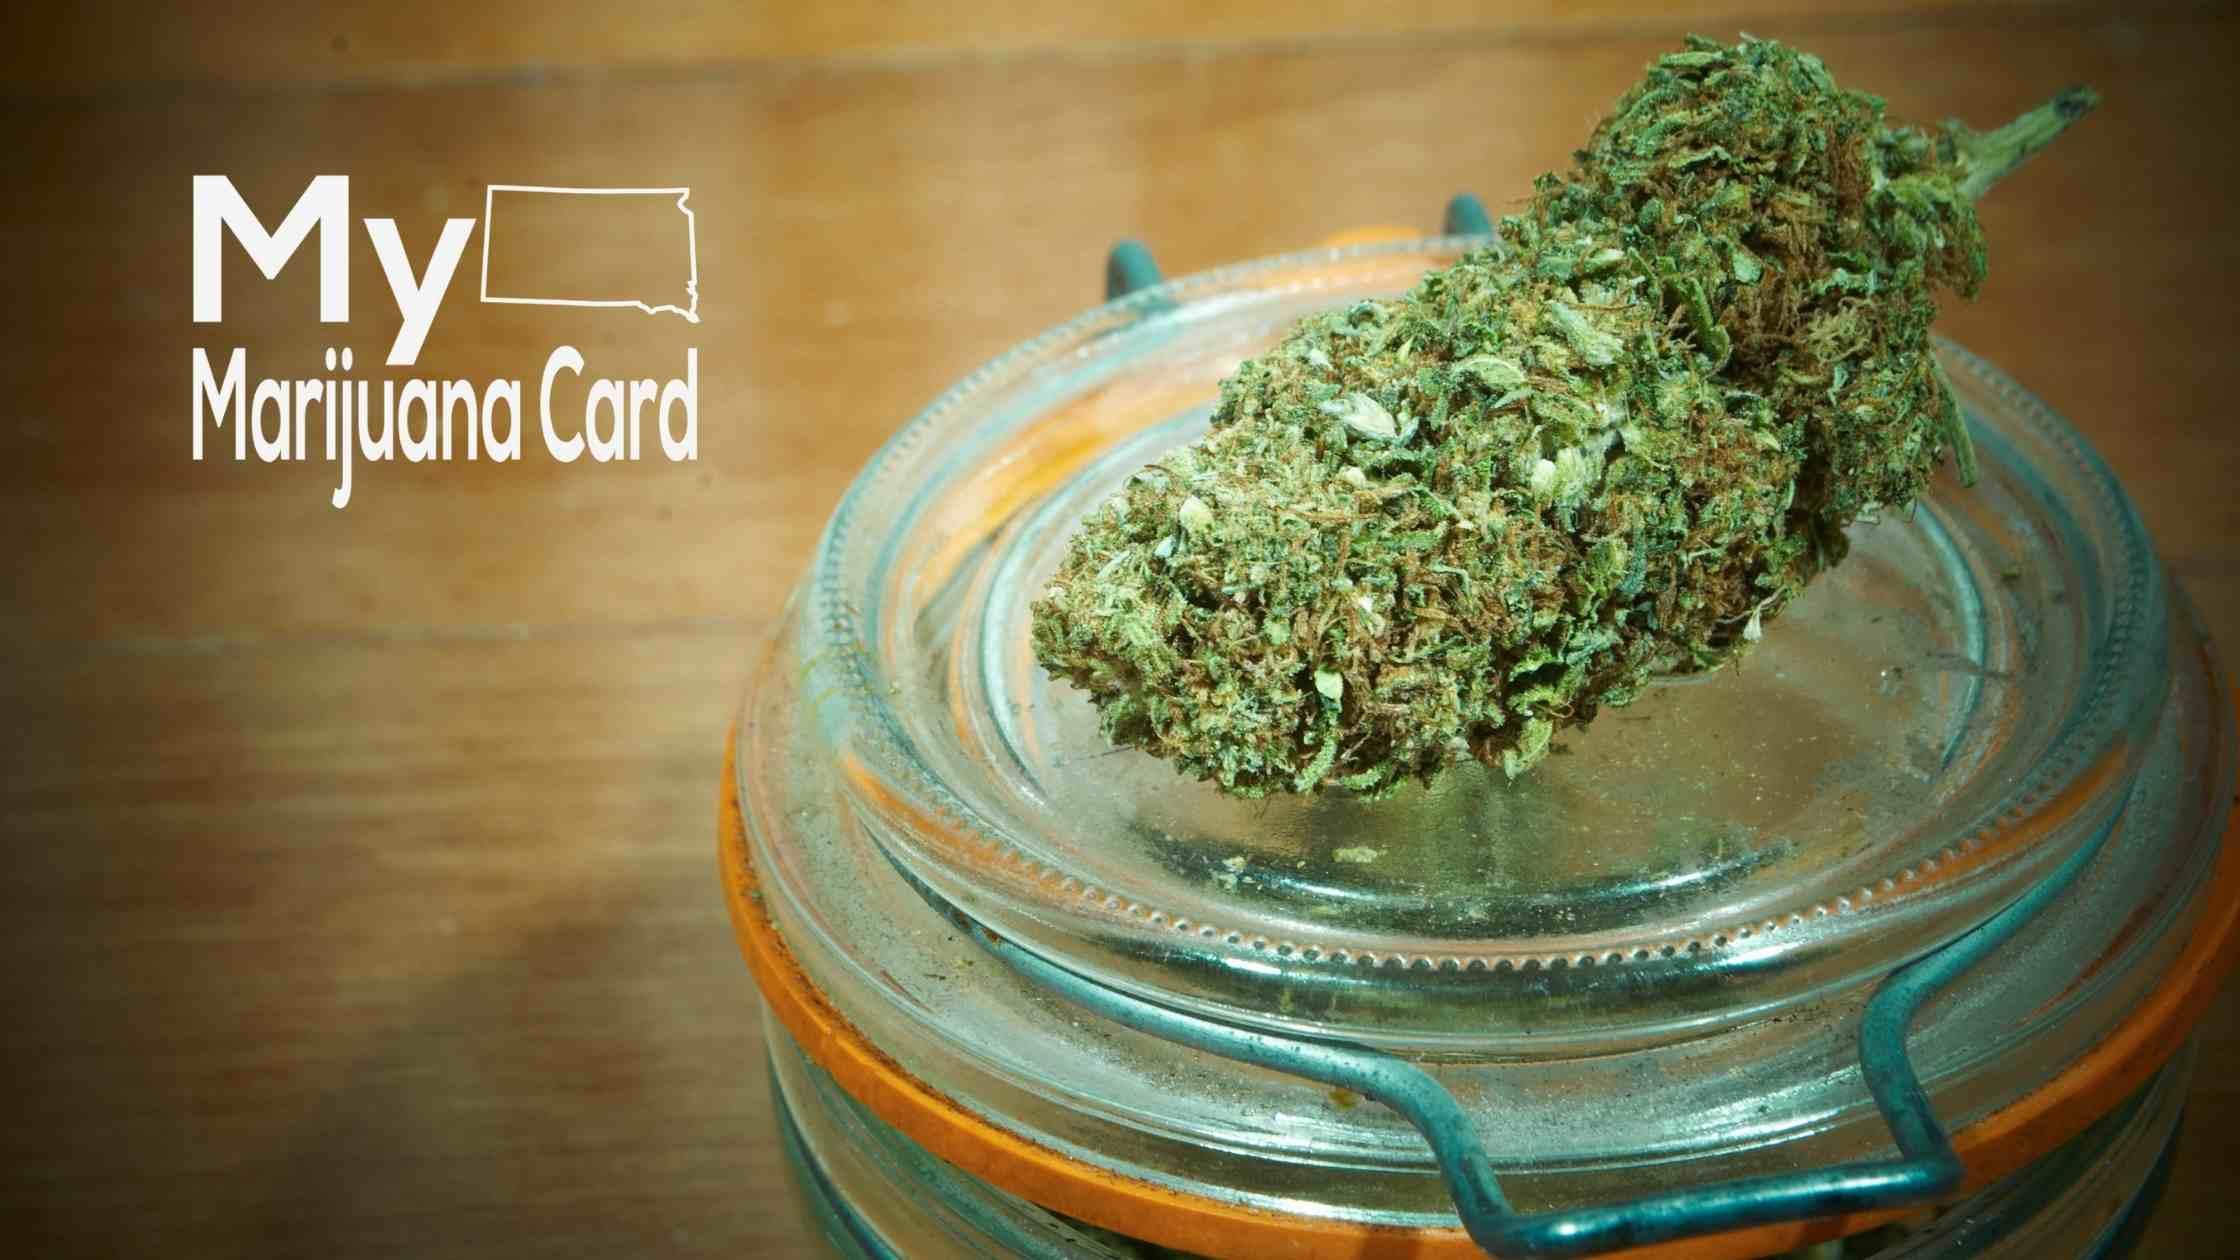 South Dakota Looks for Assistance Developing Medical Marijuana Program